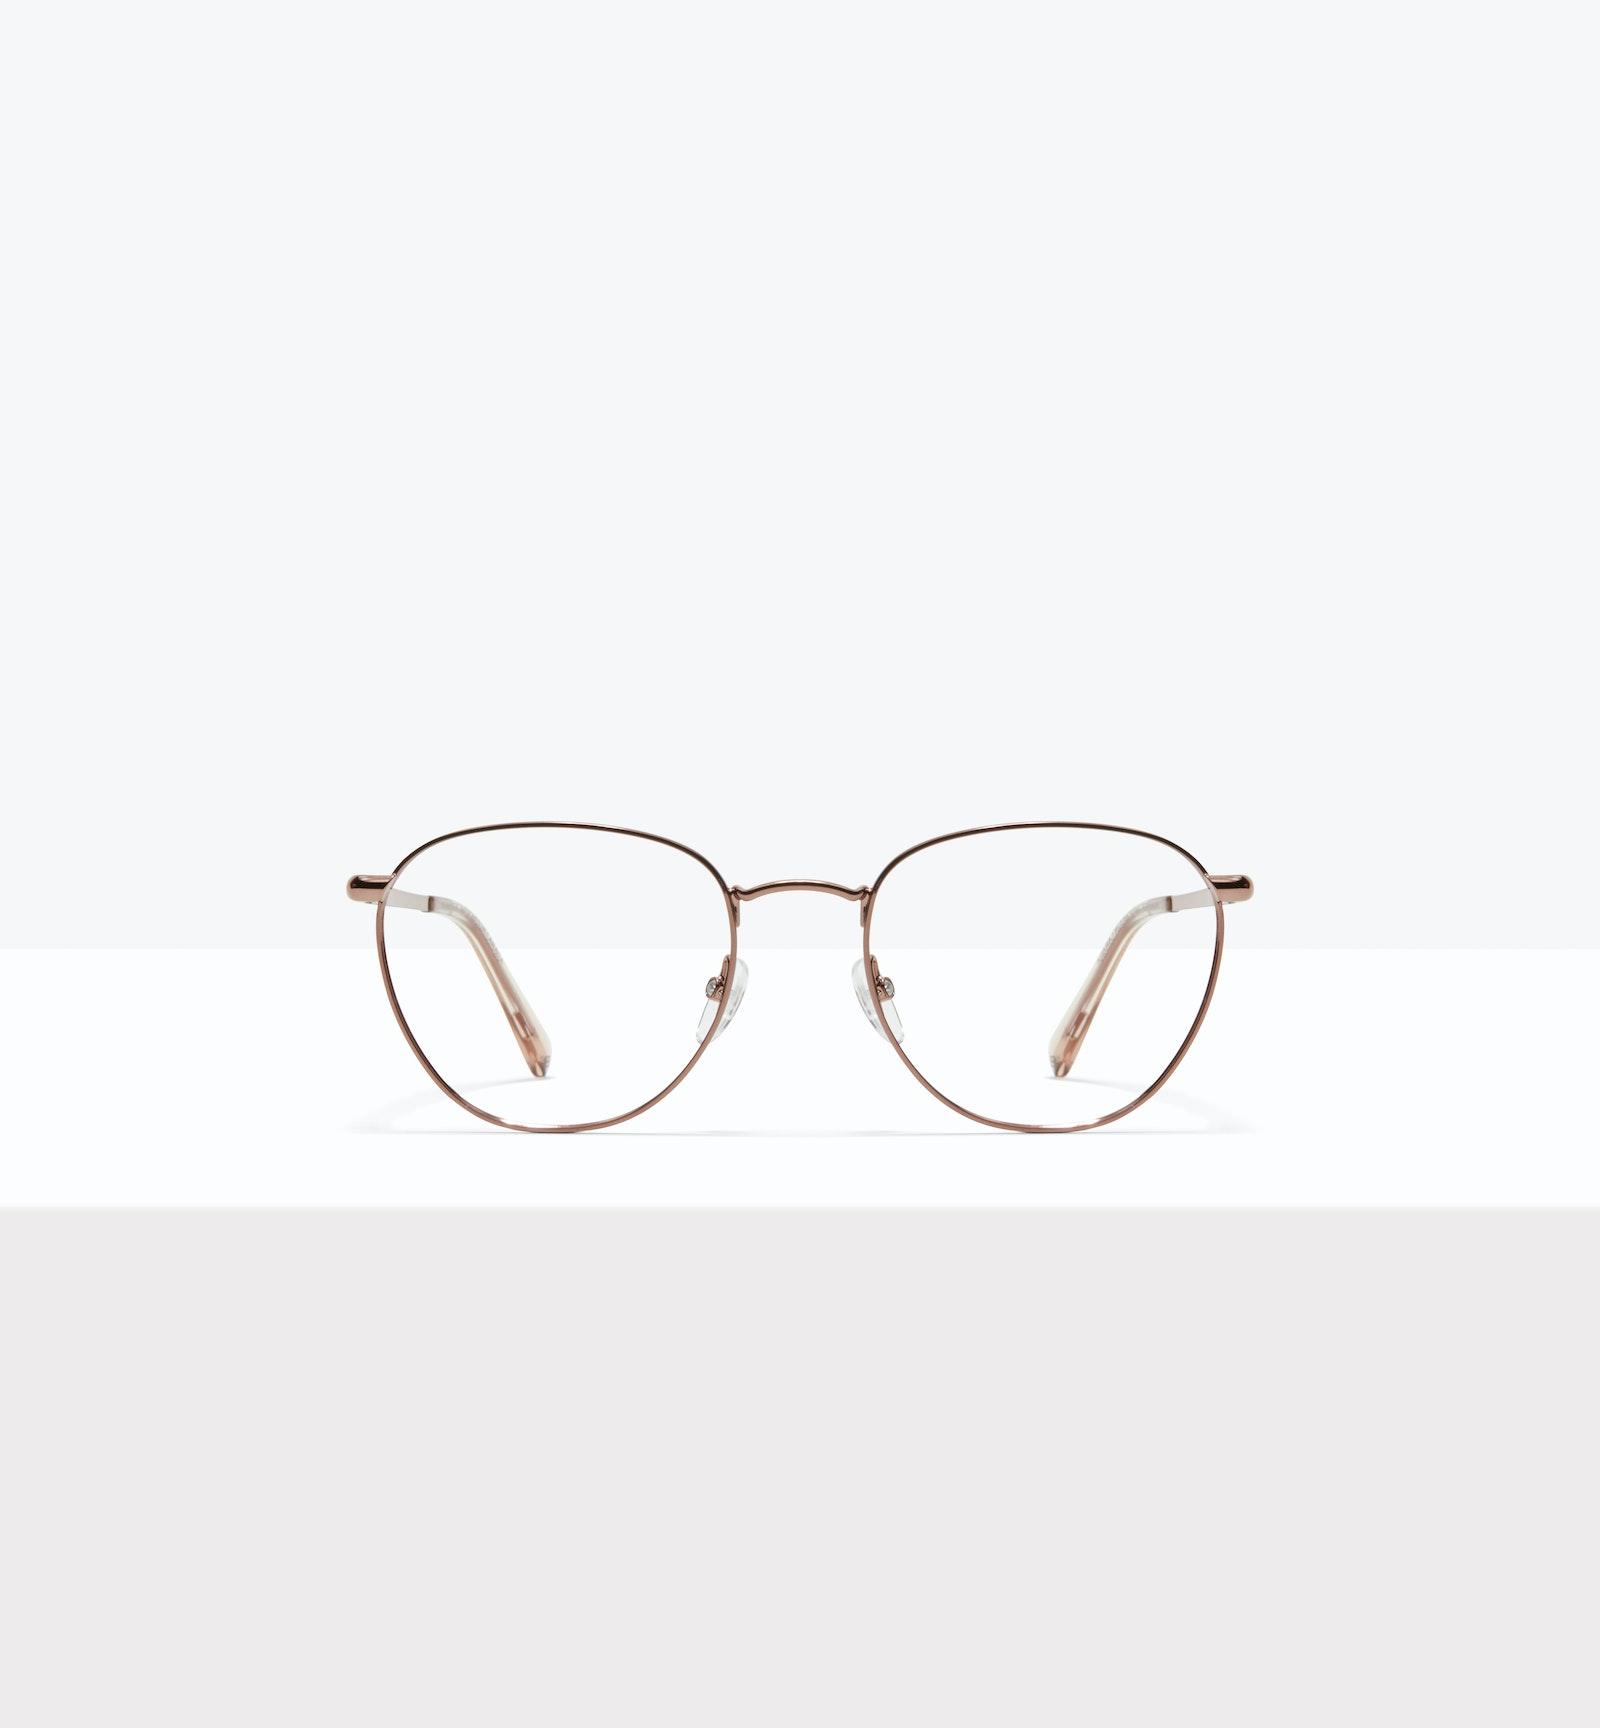 Affordable Fashion Glasses Round Eyeglasses Women Radiant L Copper